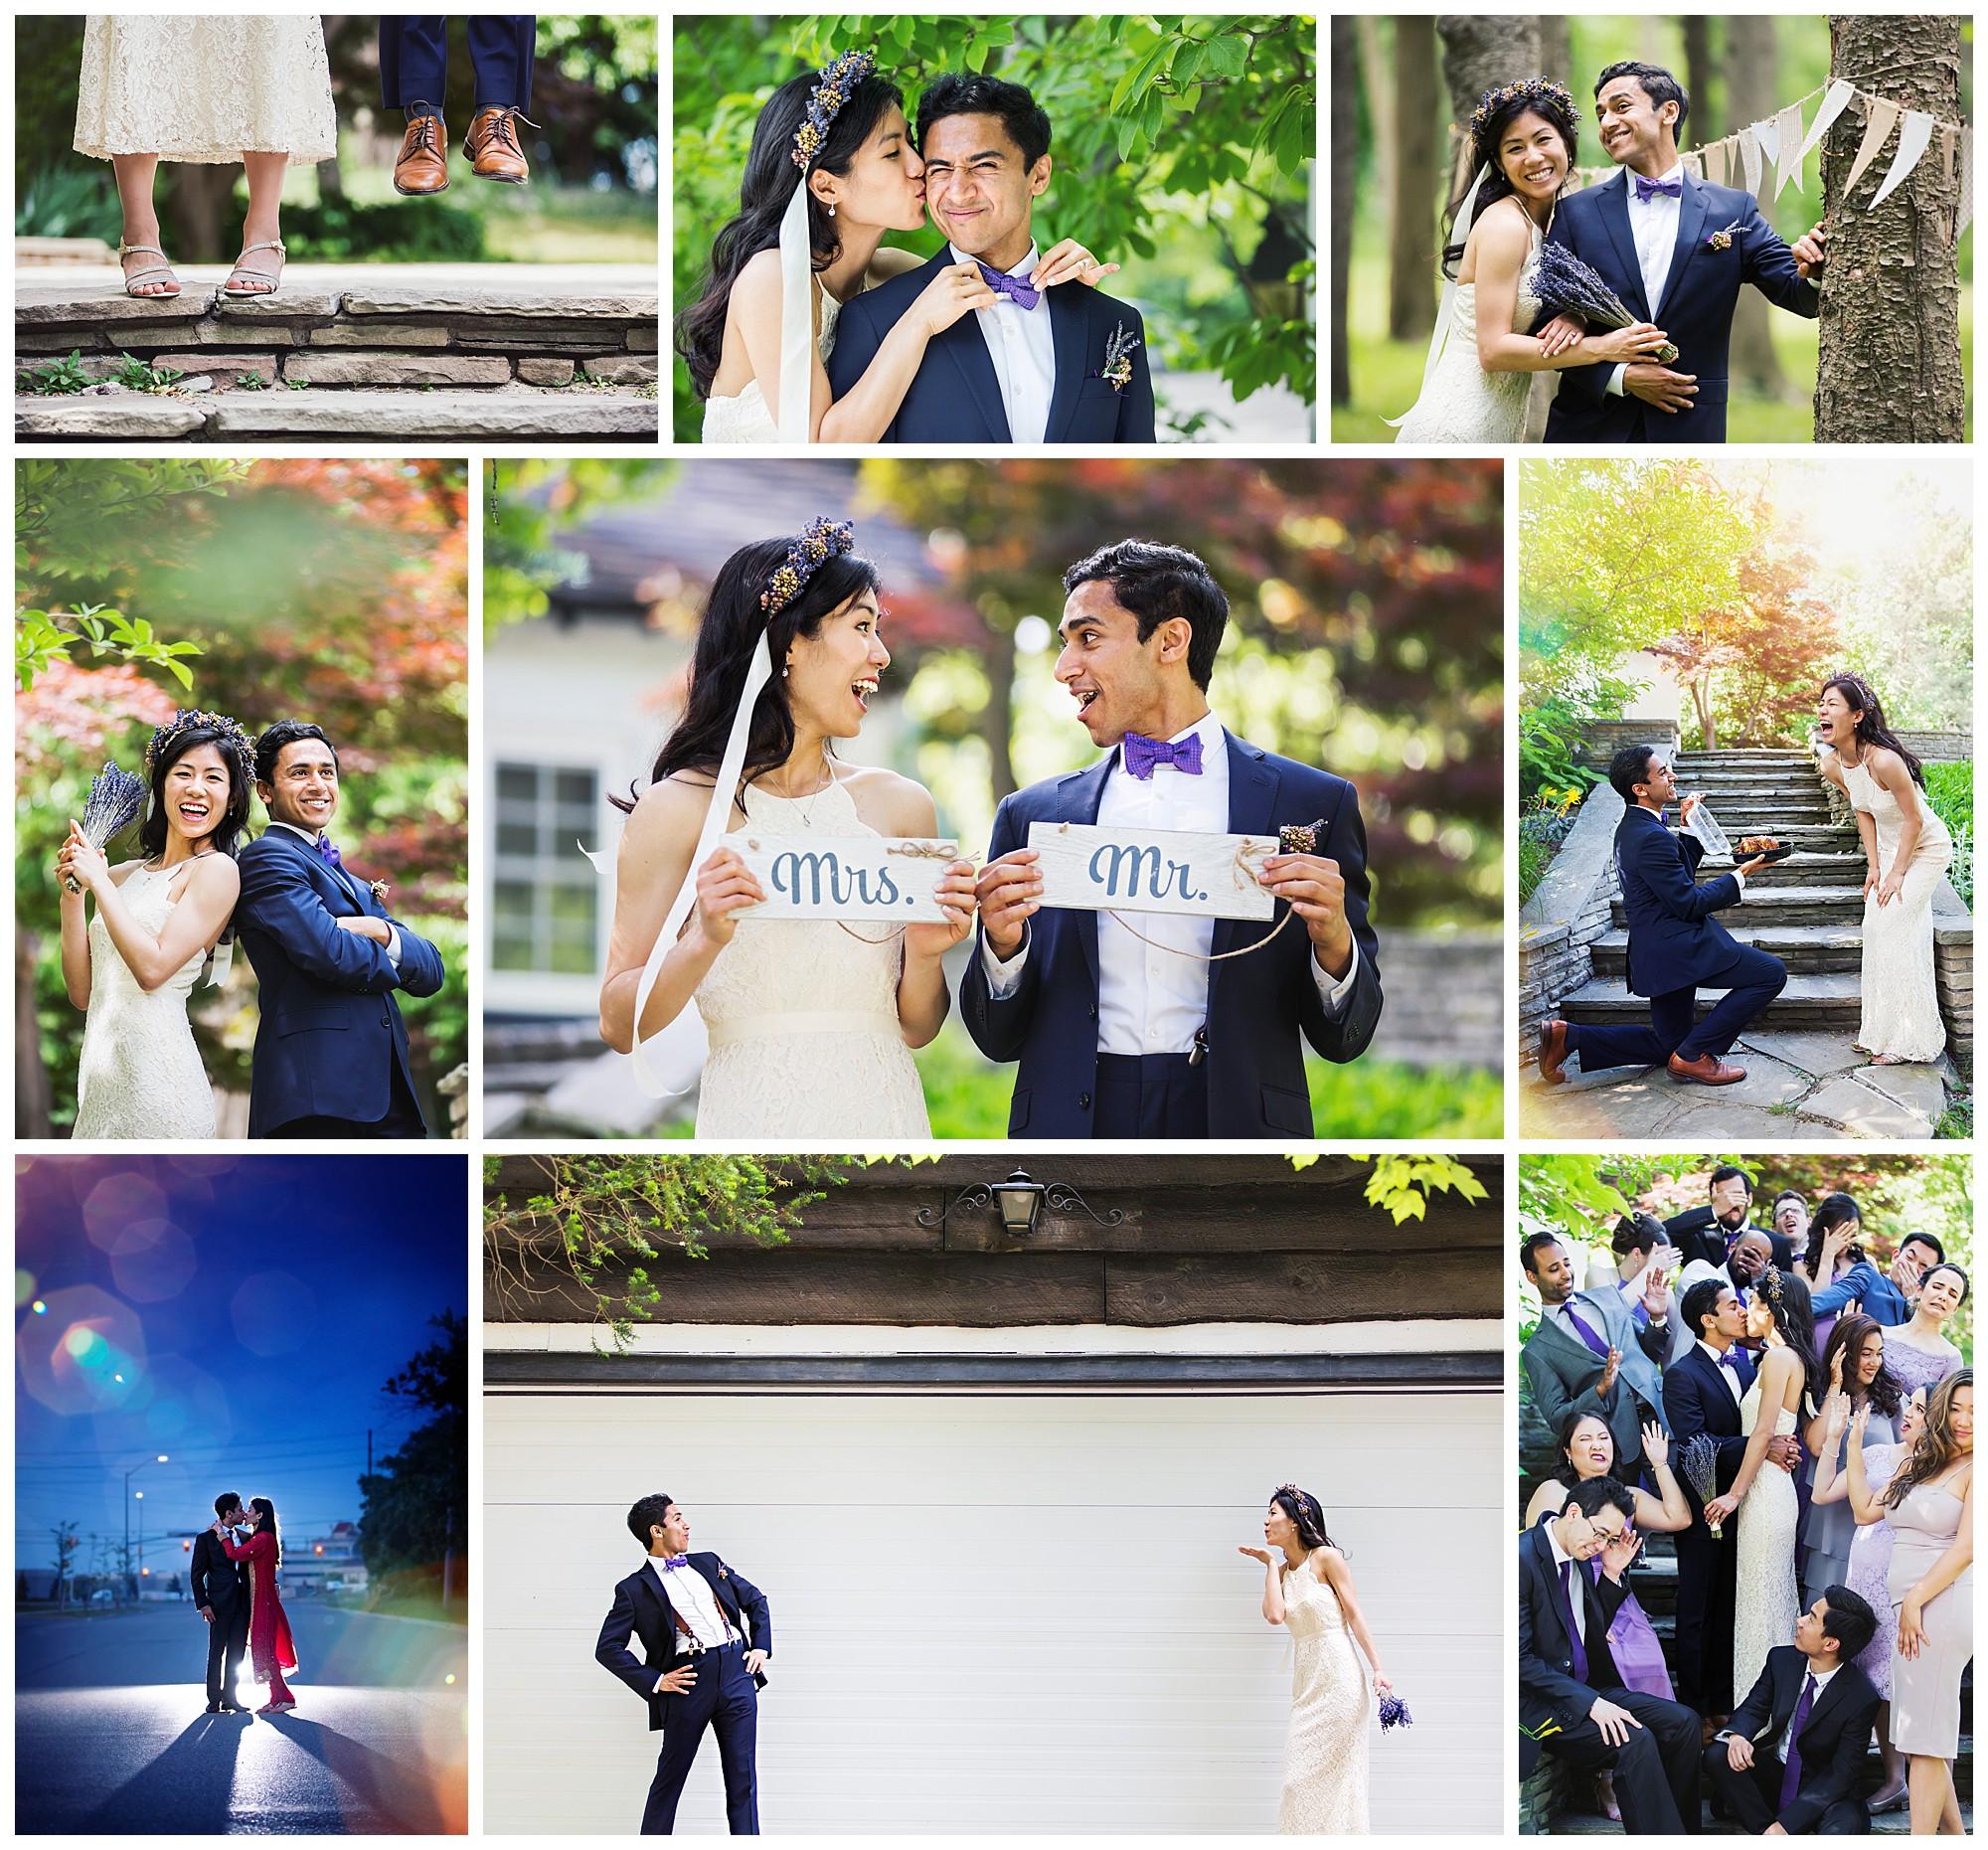 Fieldcote Memorial Park & Museum, Ancaster, Ontario wedding photography by VanDaele & Russell